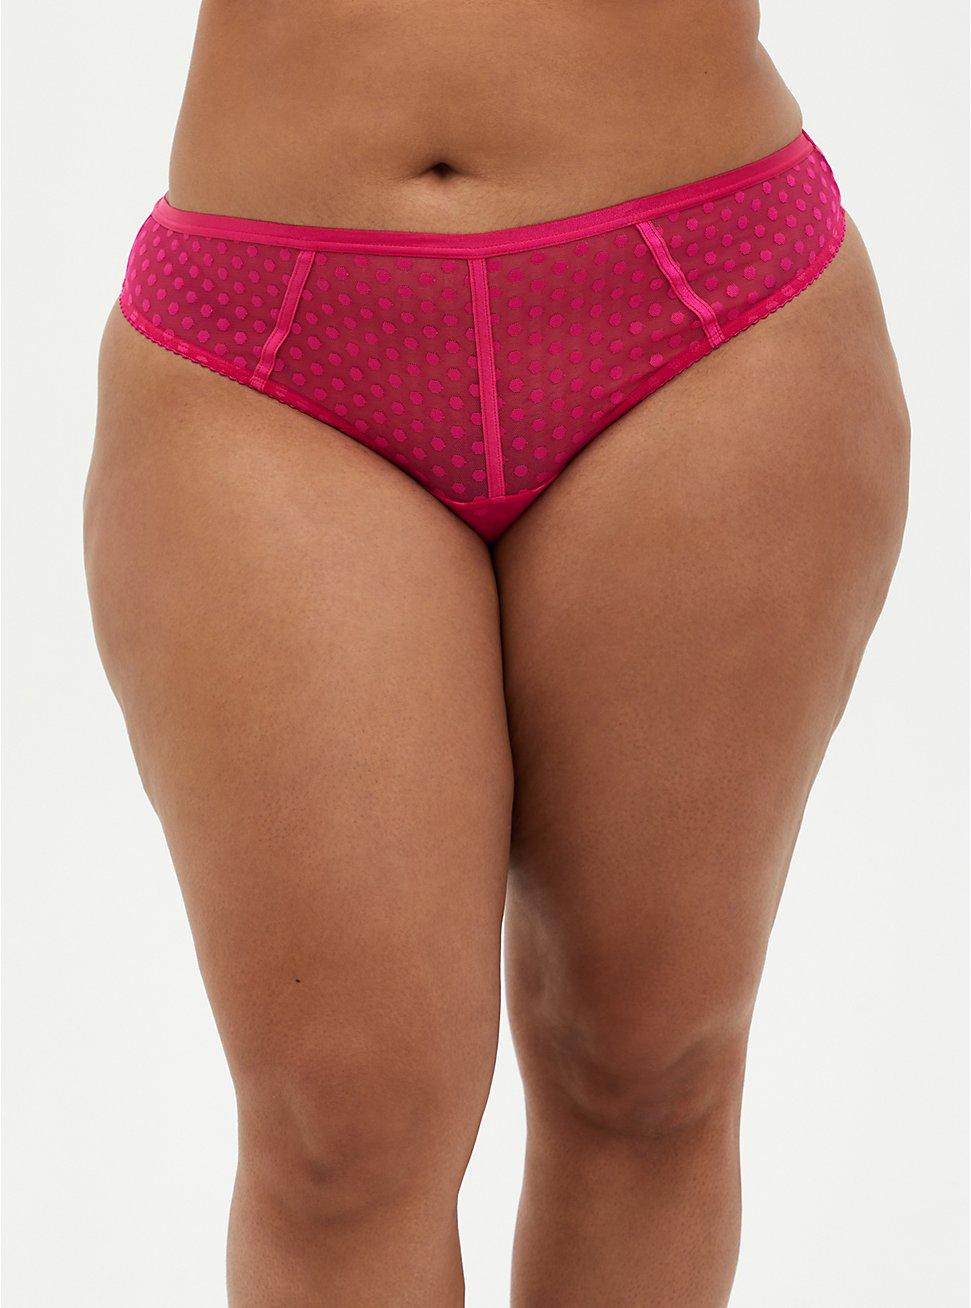 Pink Dot Mesh Cut Out Thong Panty, BEET ROOT PINK, hi-res